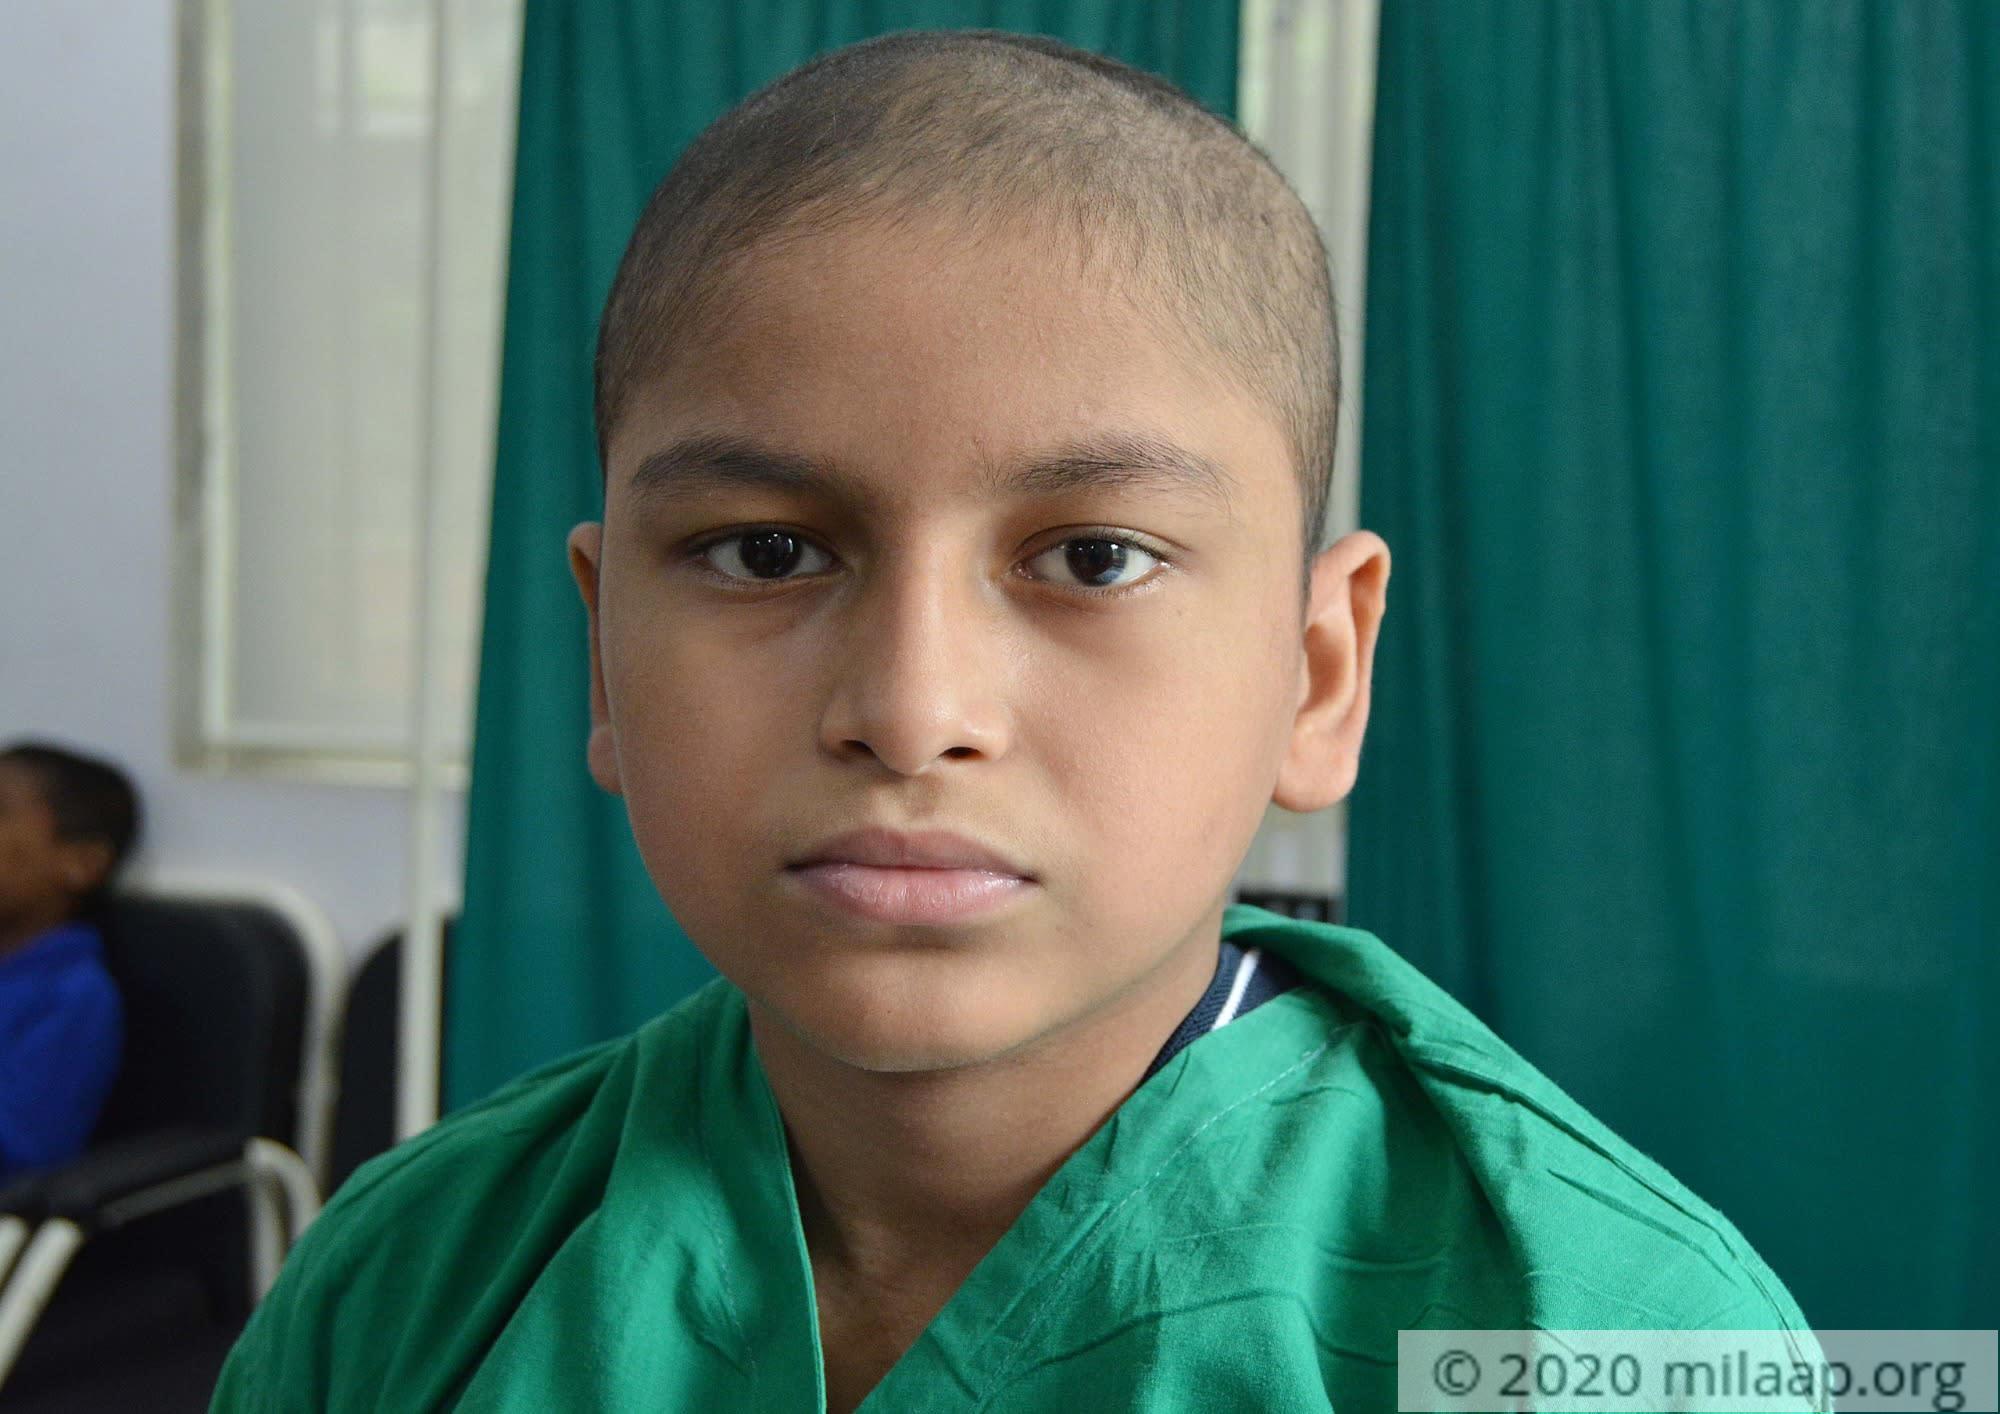 Jayadrath mcgm borivali 01 a2wi90 1569953233